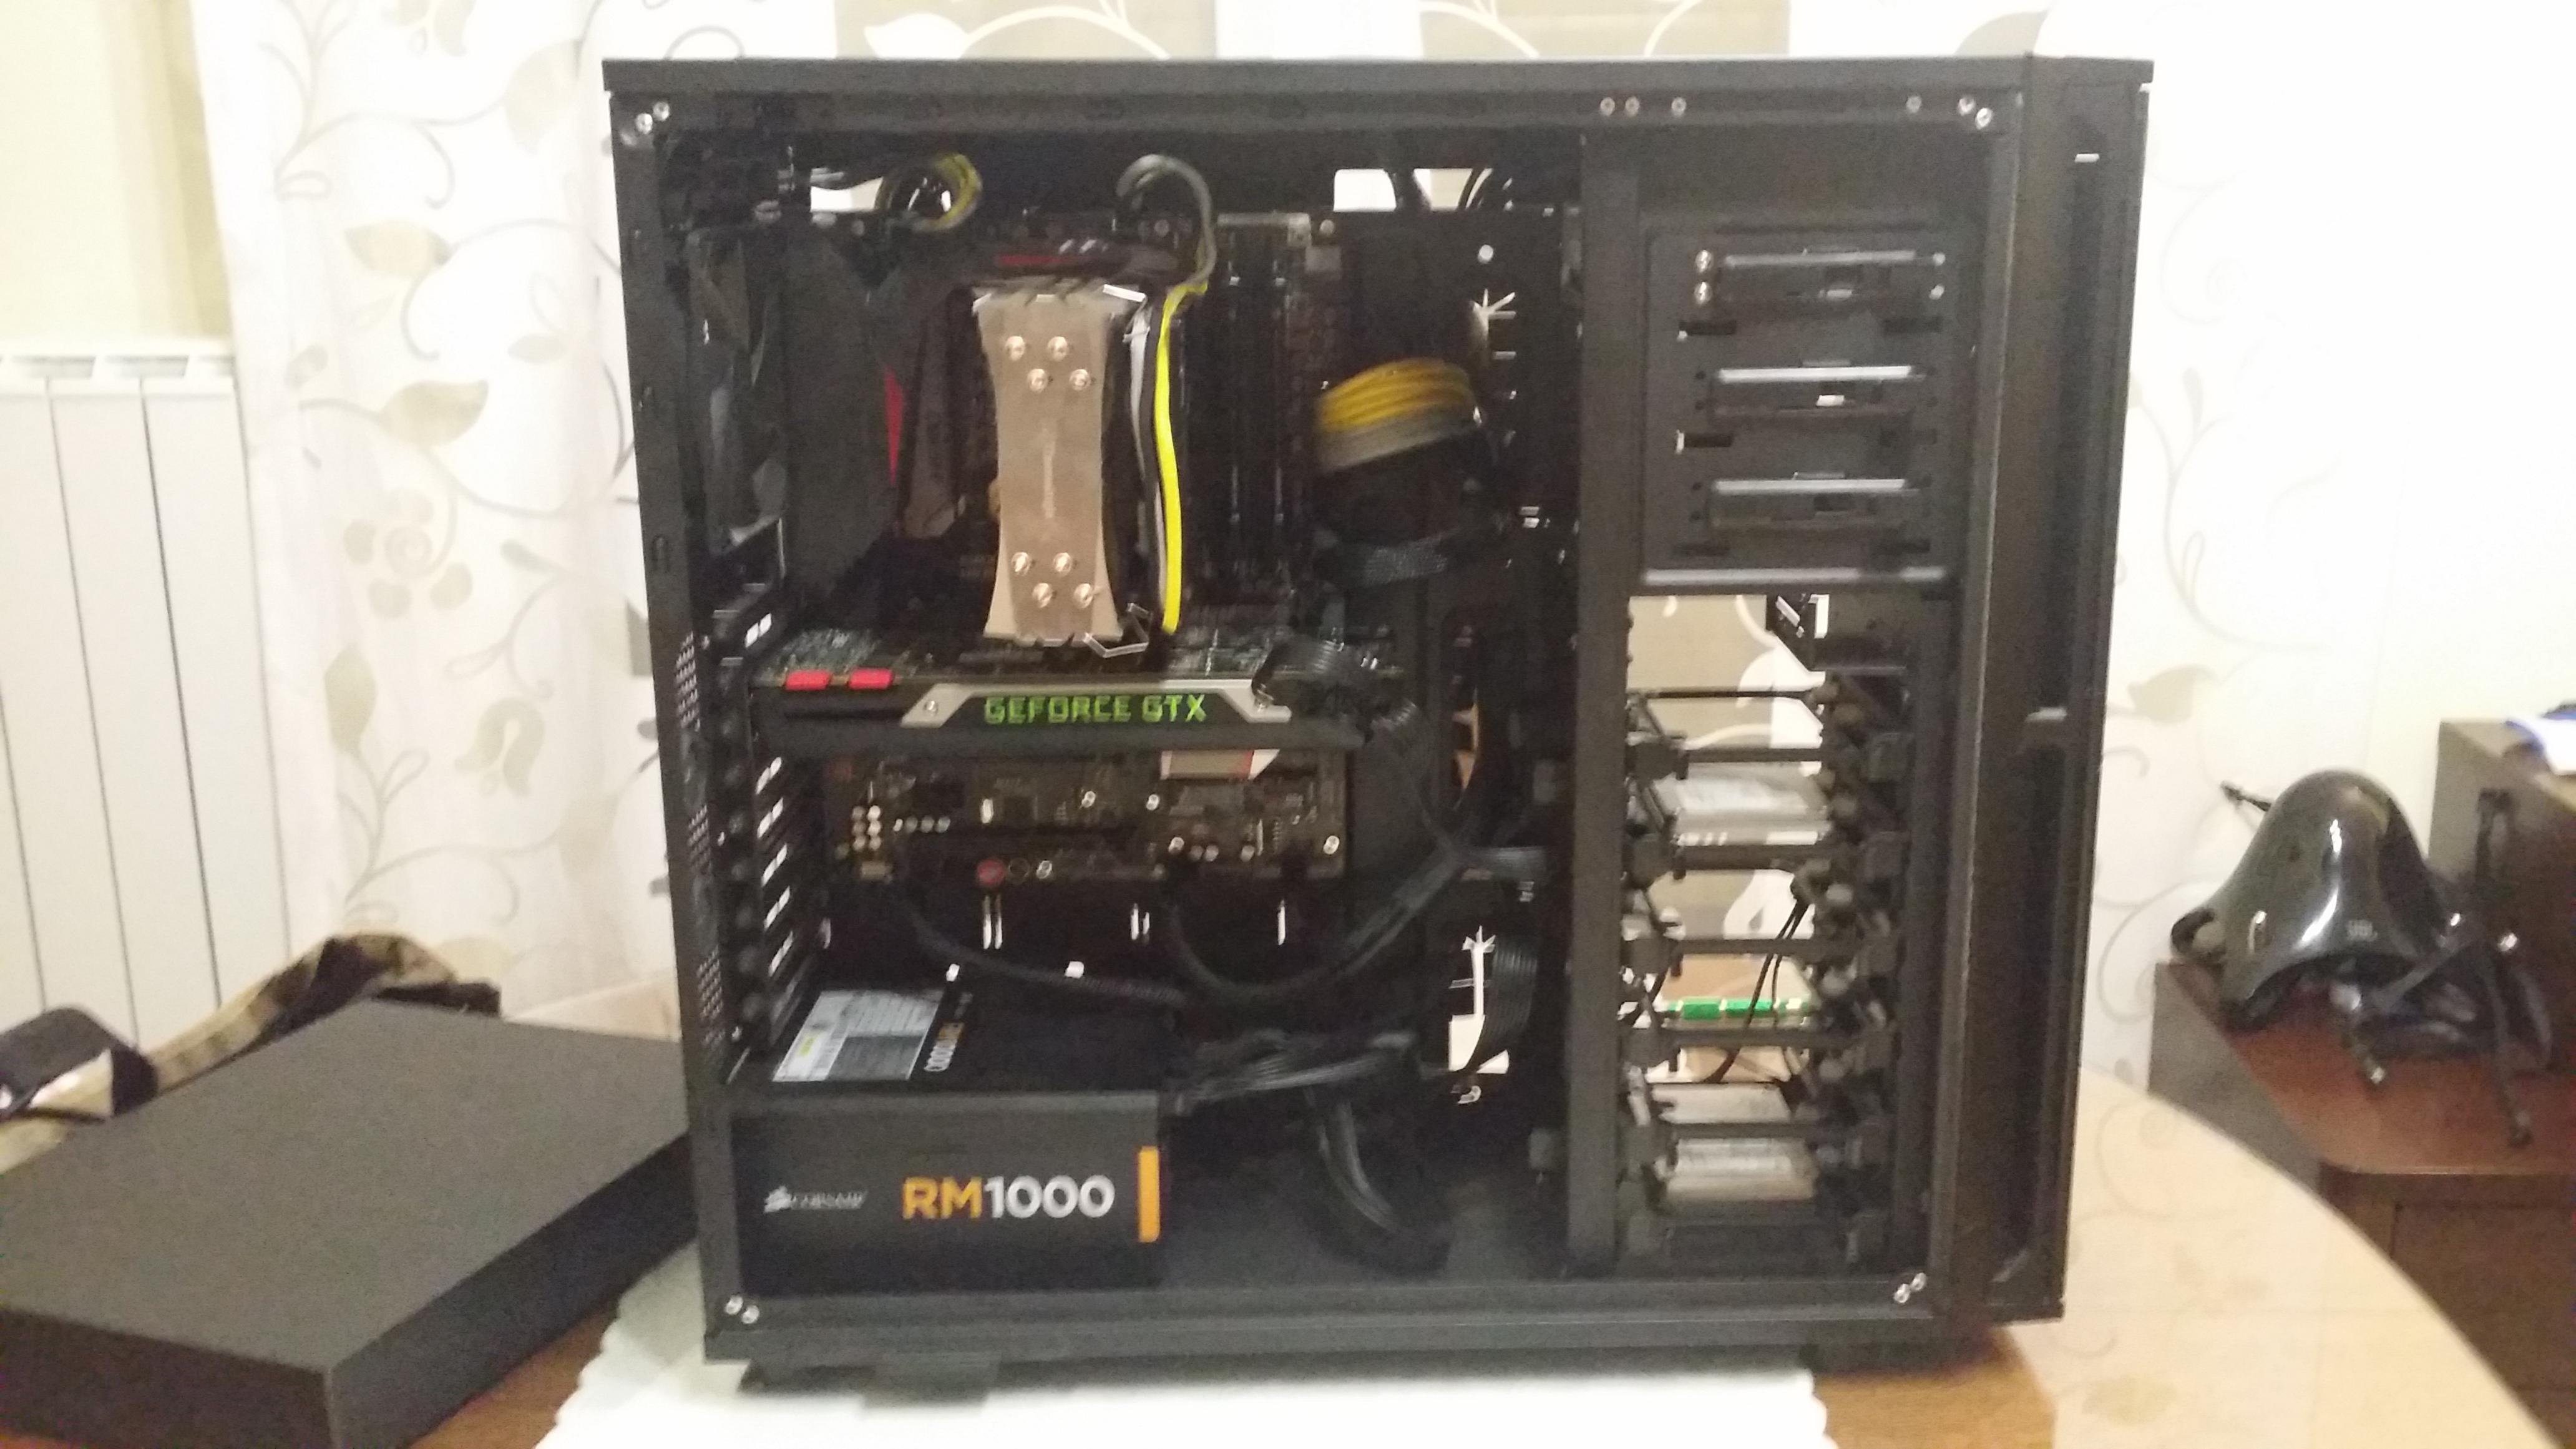 5th main PC. z170, it 6700K, Nvidia TITAN x, Samsung PRO 950 NVMe, ASUS ROG